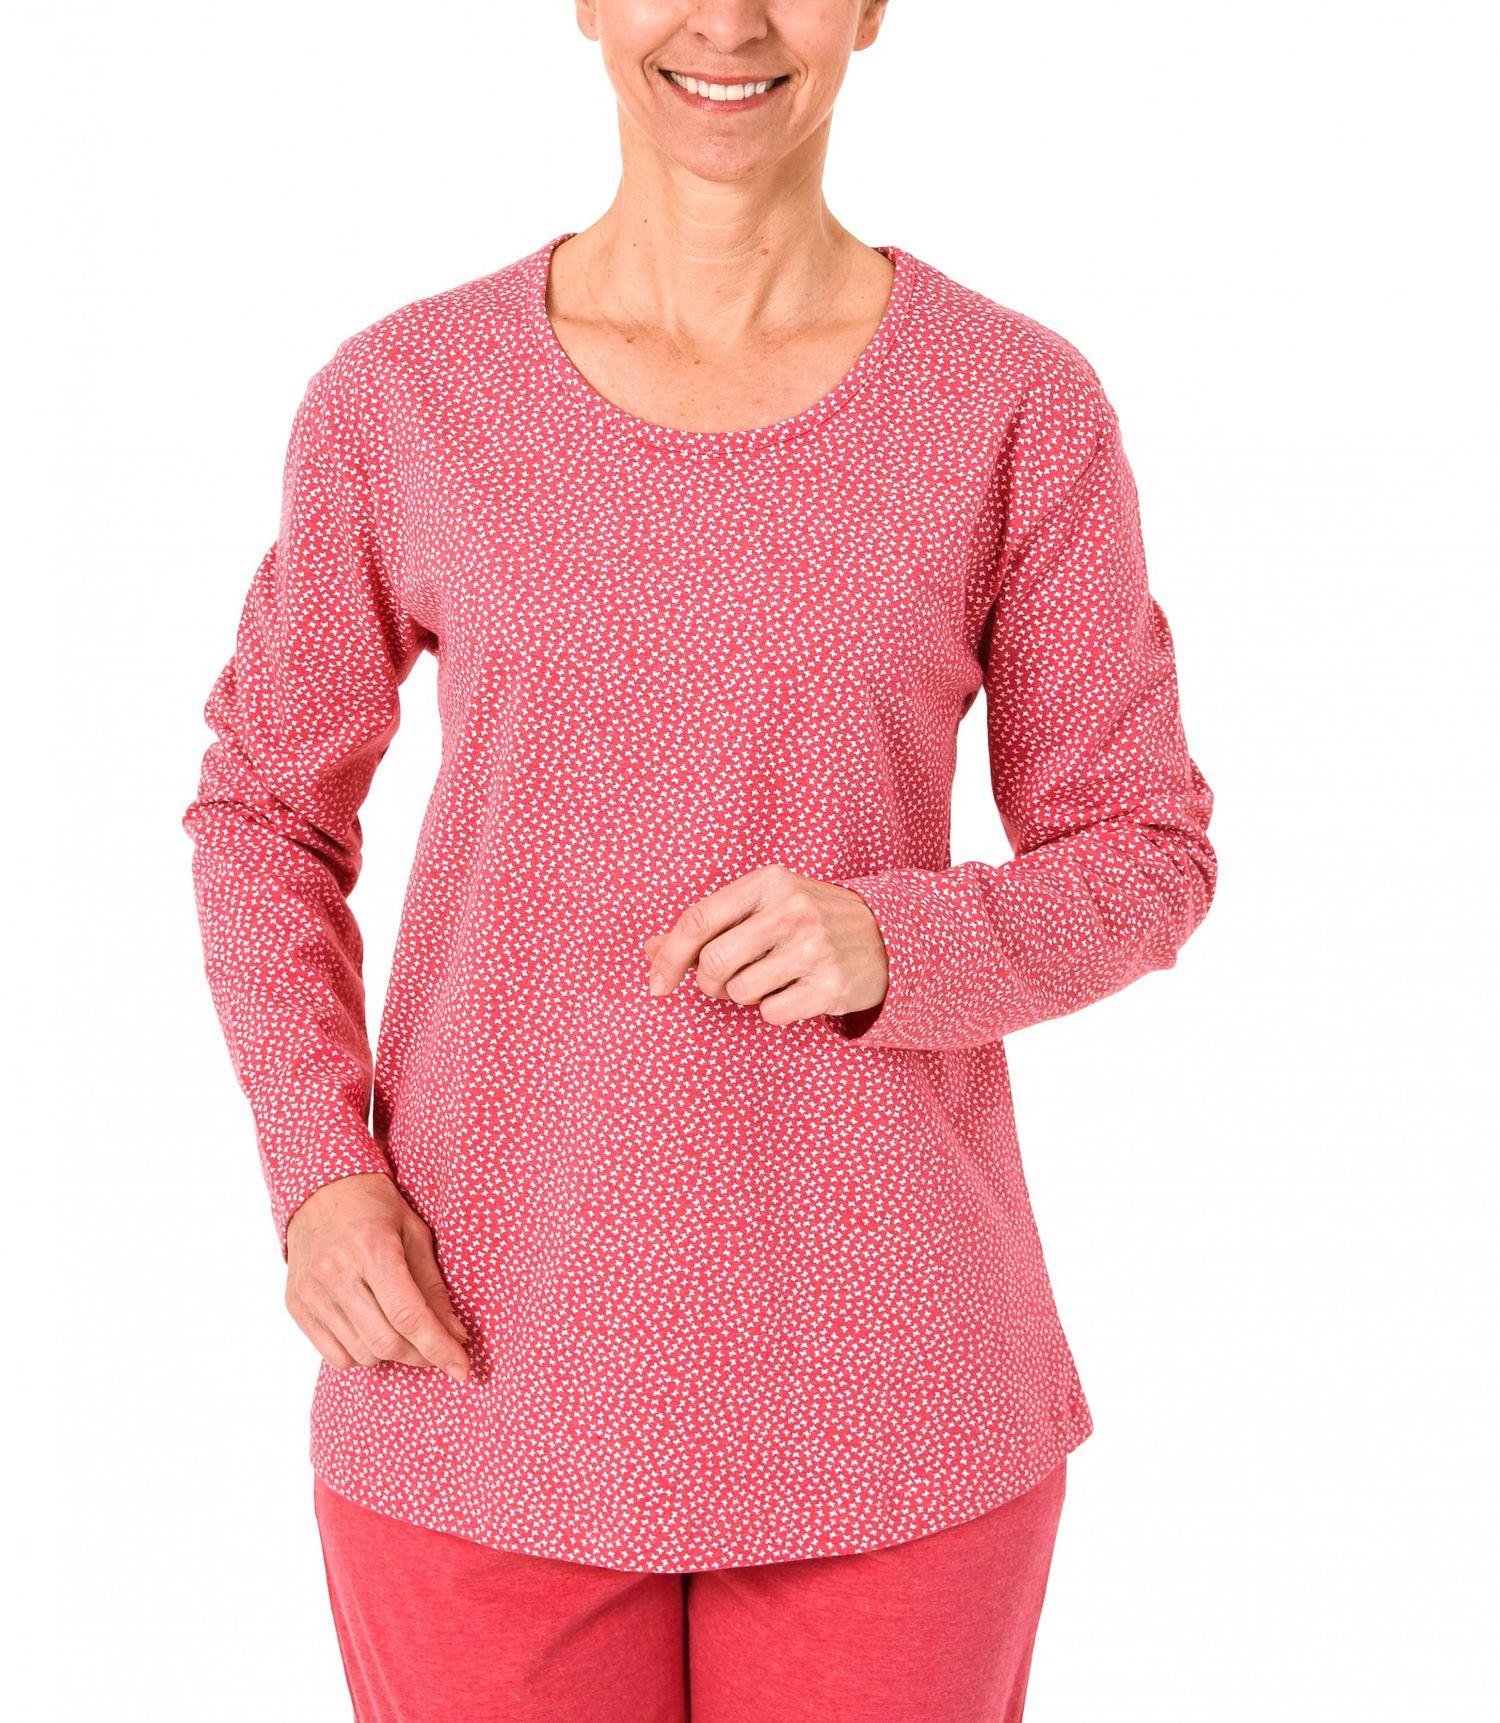 Damen Shirt  Oberteil - langarm Mix & Match Minimalprint – 171 219 90 904 – Bild 1